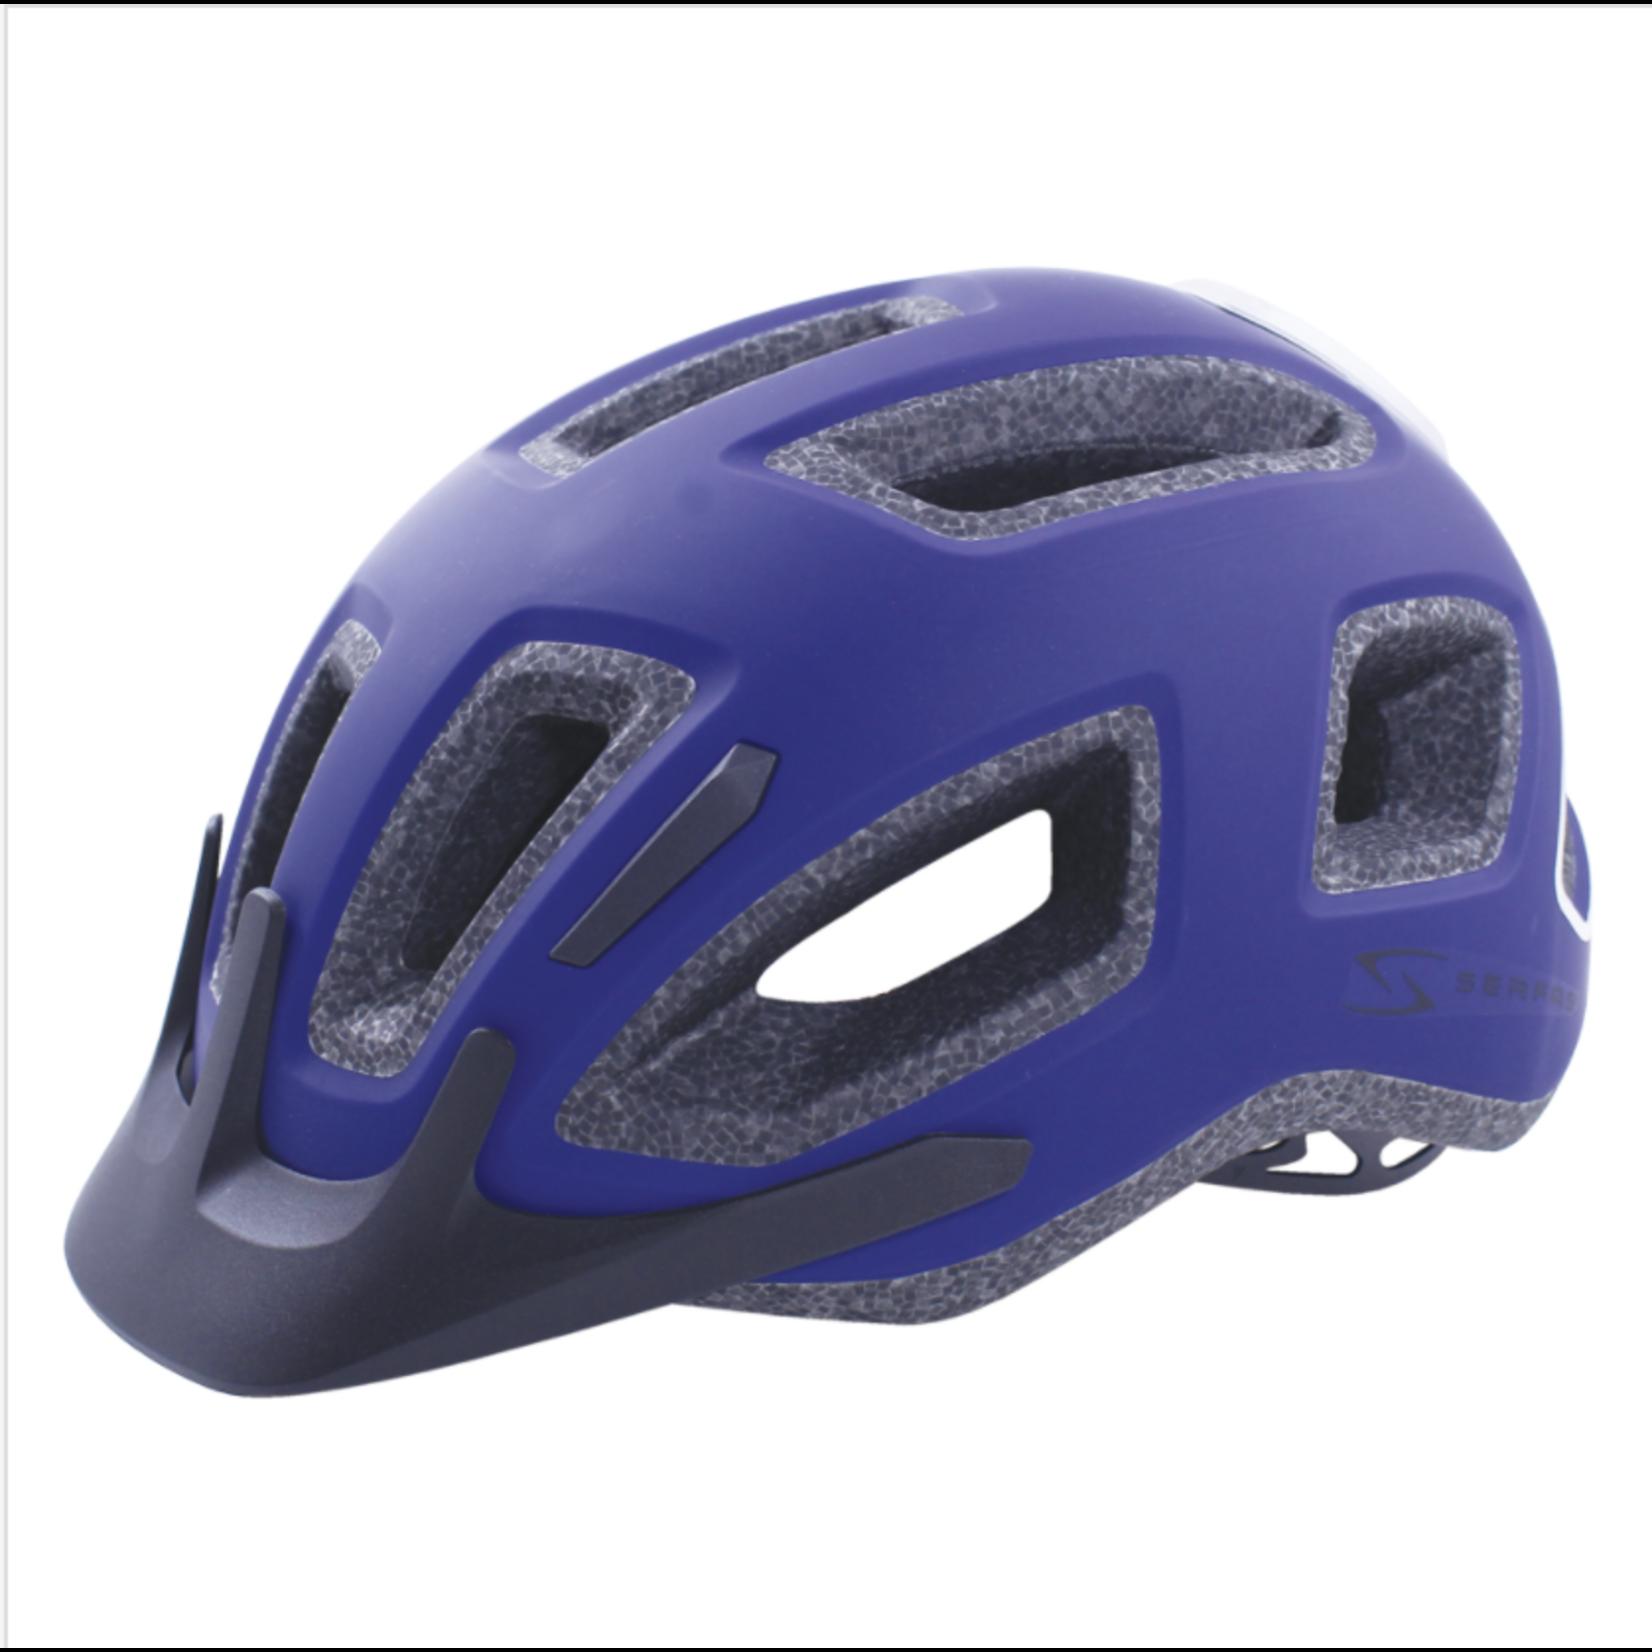 SERFAS Helmet HT- 404BLBK  Metro L/XL Blue (SERFAS)